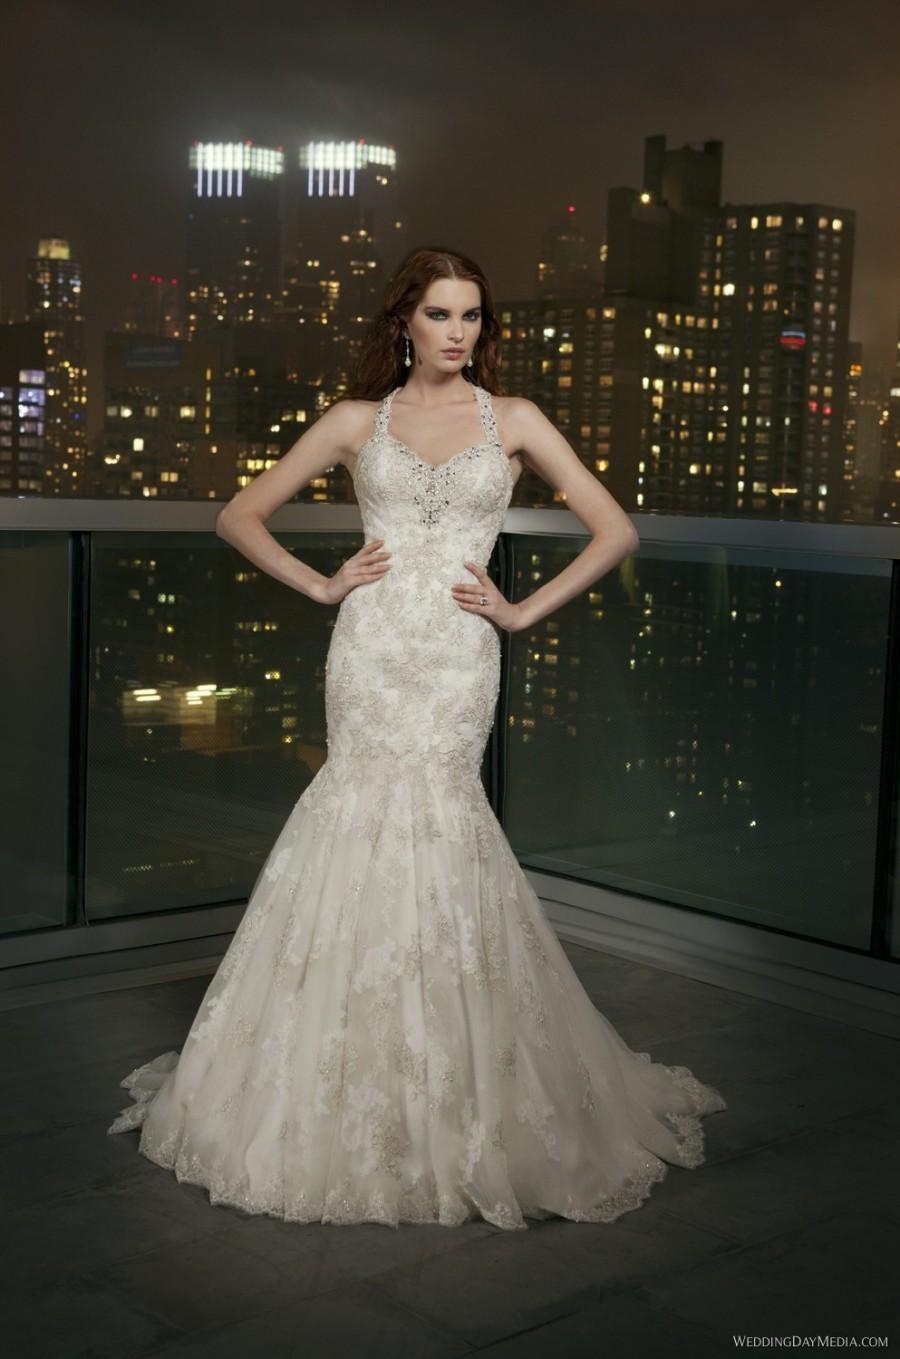 Hochzeit - Justin Alexander - 9704 - Signature 2013 - Glamorous Wedding Dresses